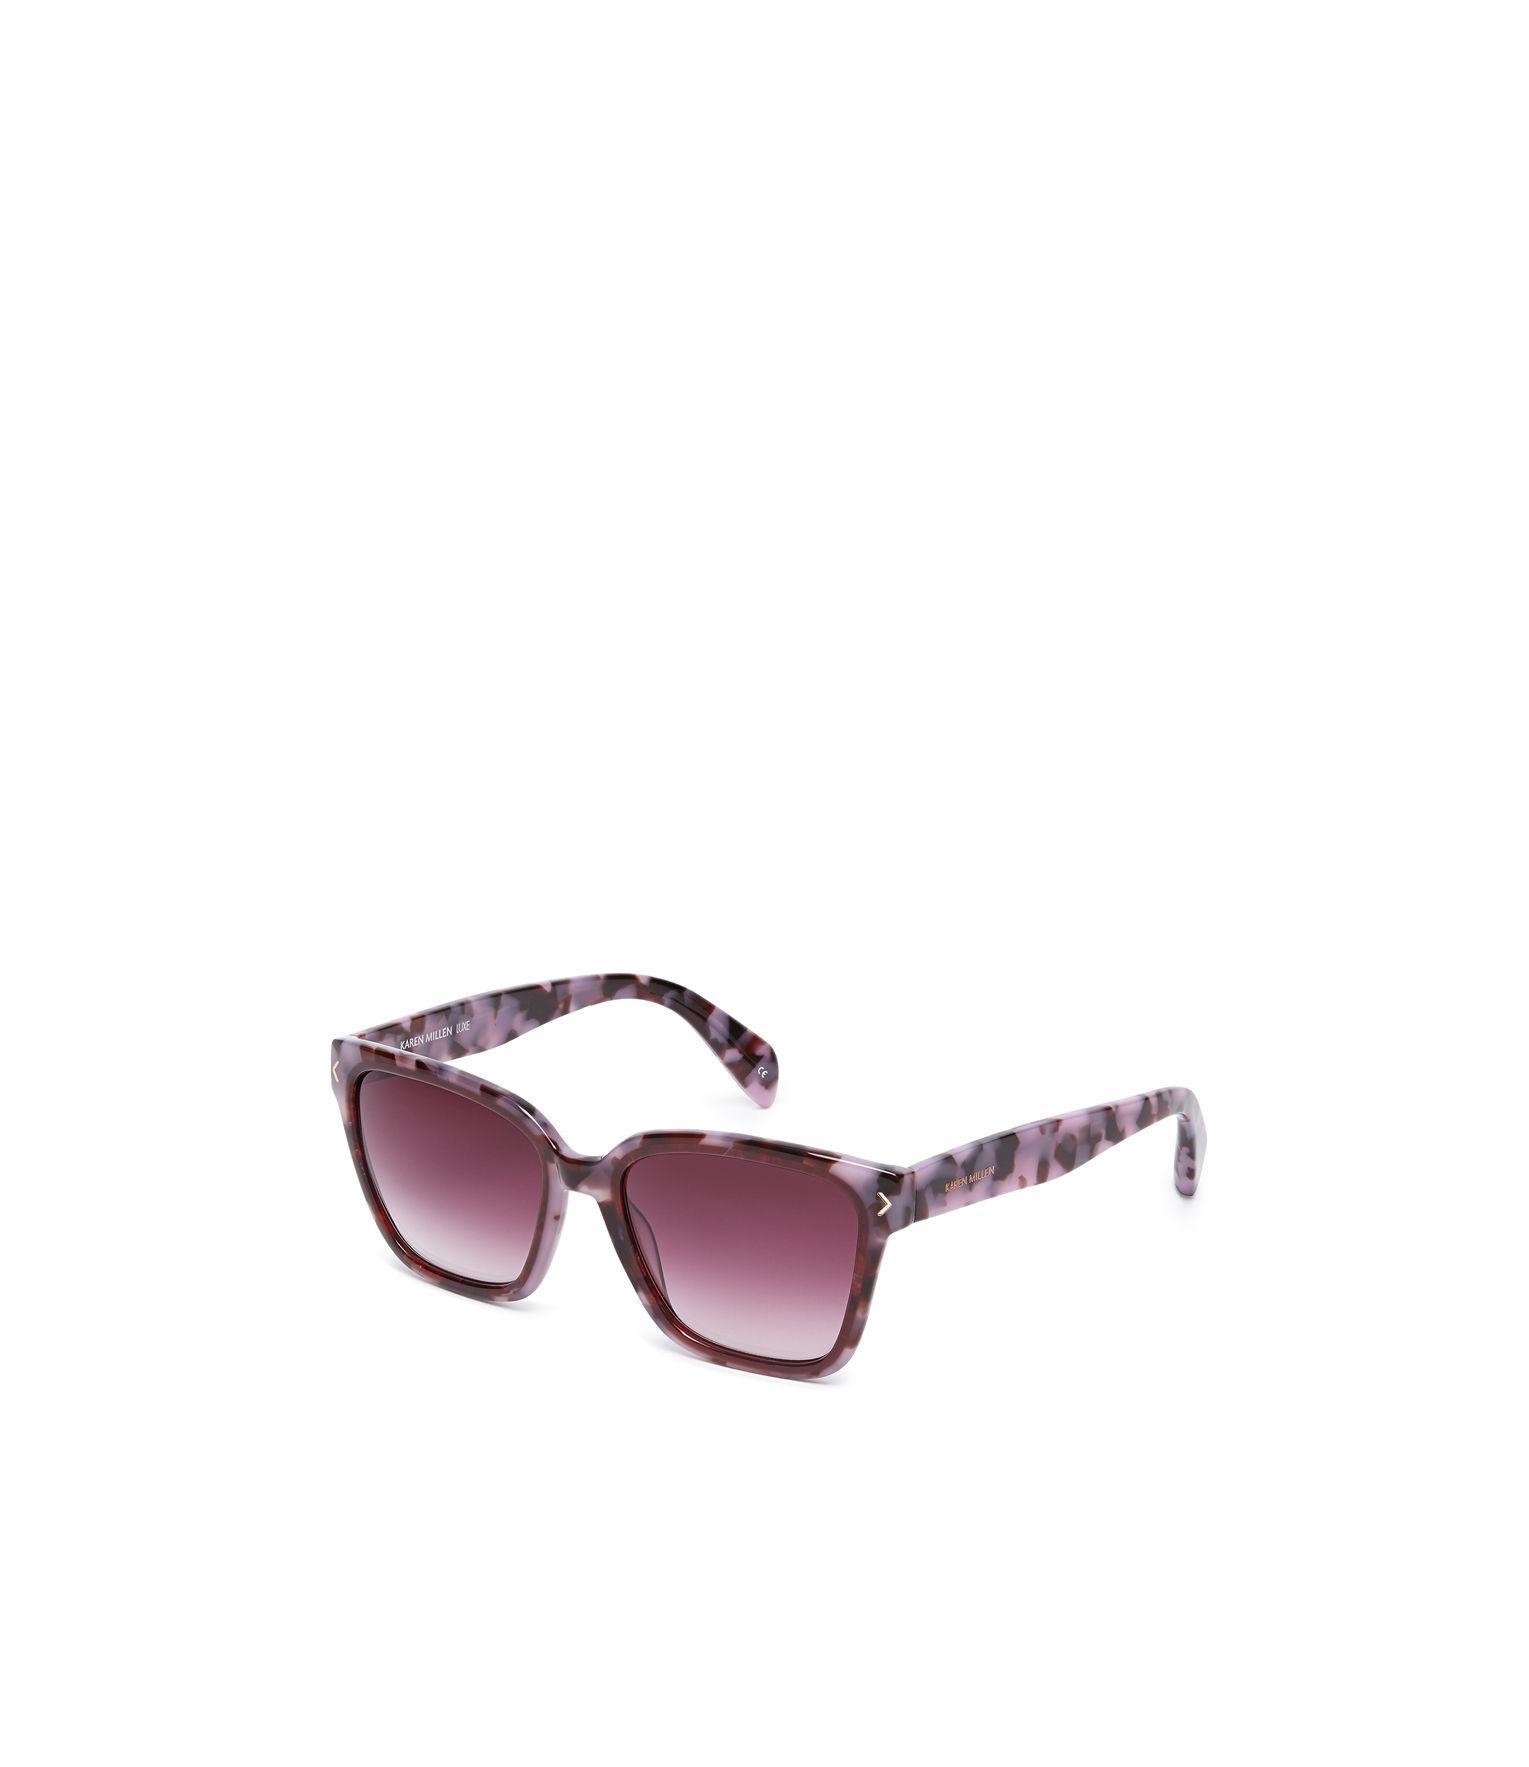 75a3dc3bcc Lyst - Karen Millen Deep Square Sunglasses in Pink